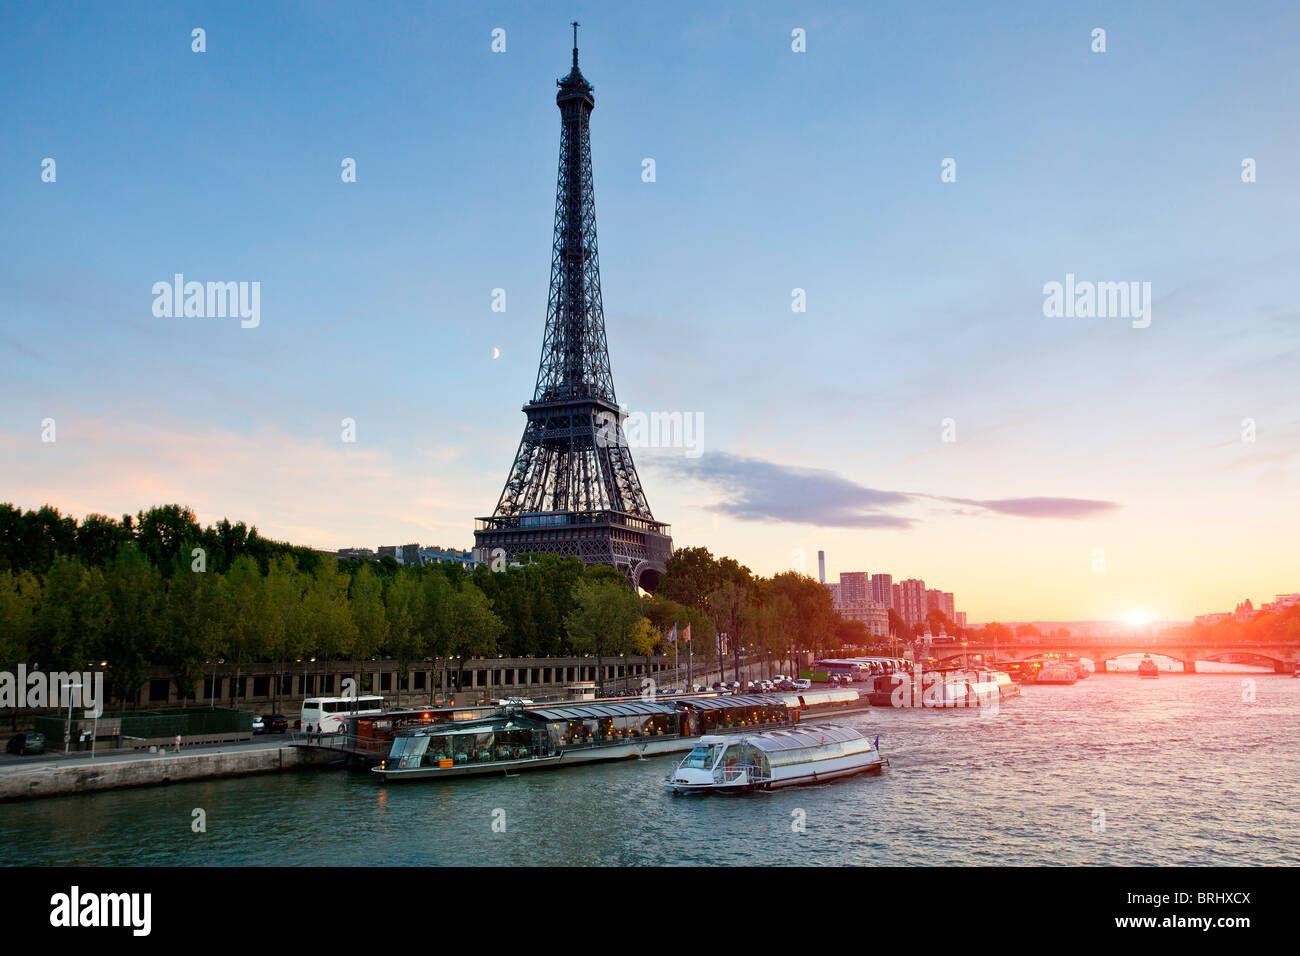 Paris, Seine River and Tour Eiffel at Sunset - Stock Image